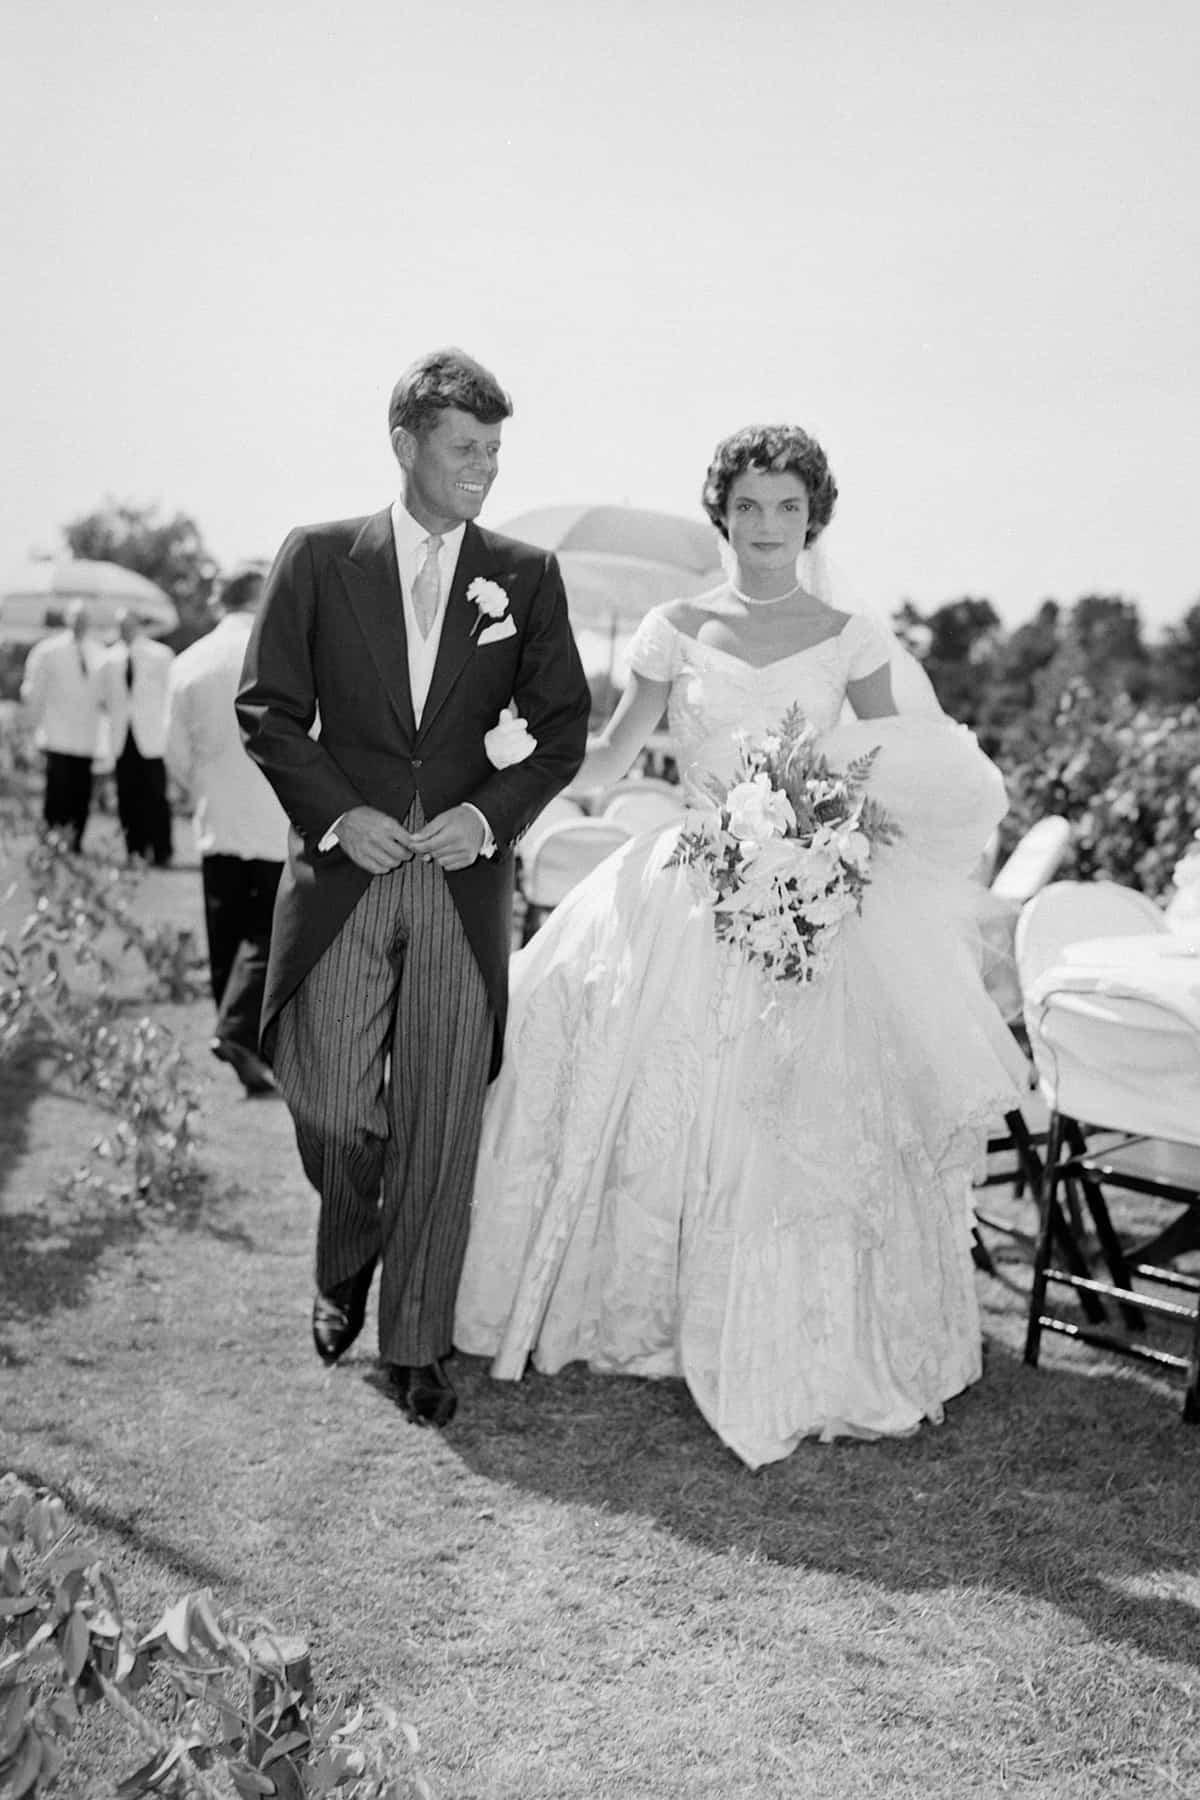 John F. Kennedy and Jacqueline Bouvier, 1953